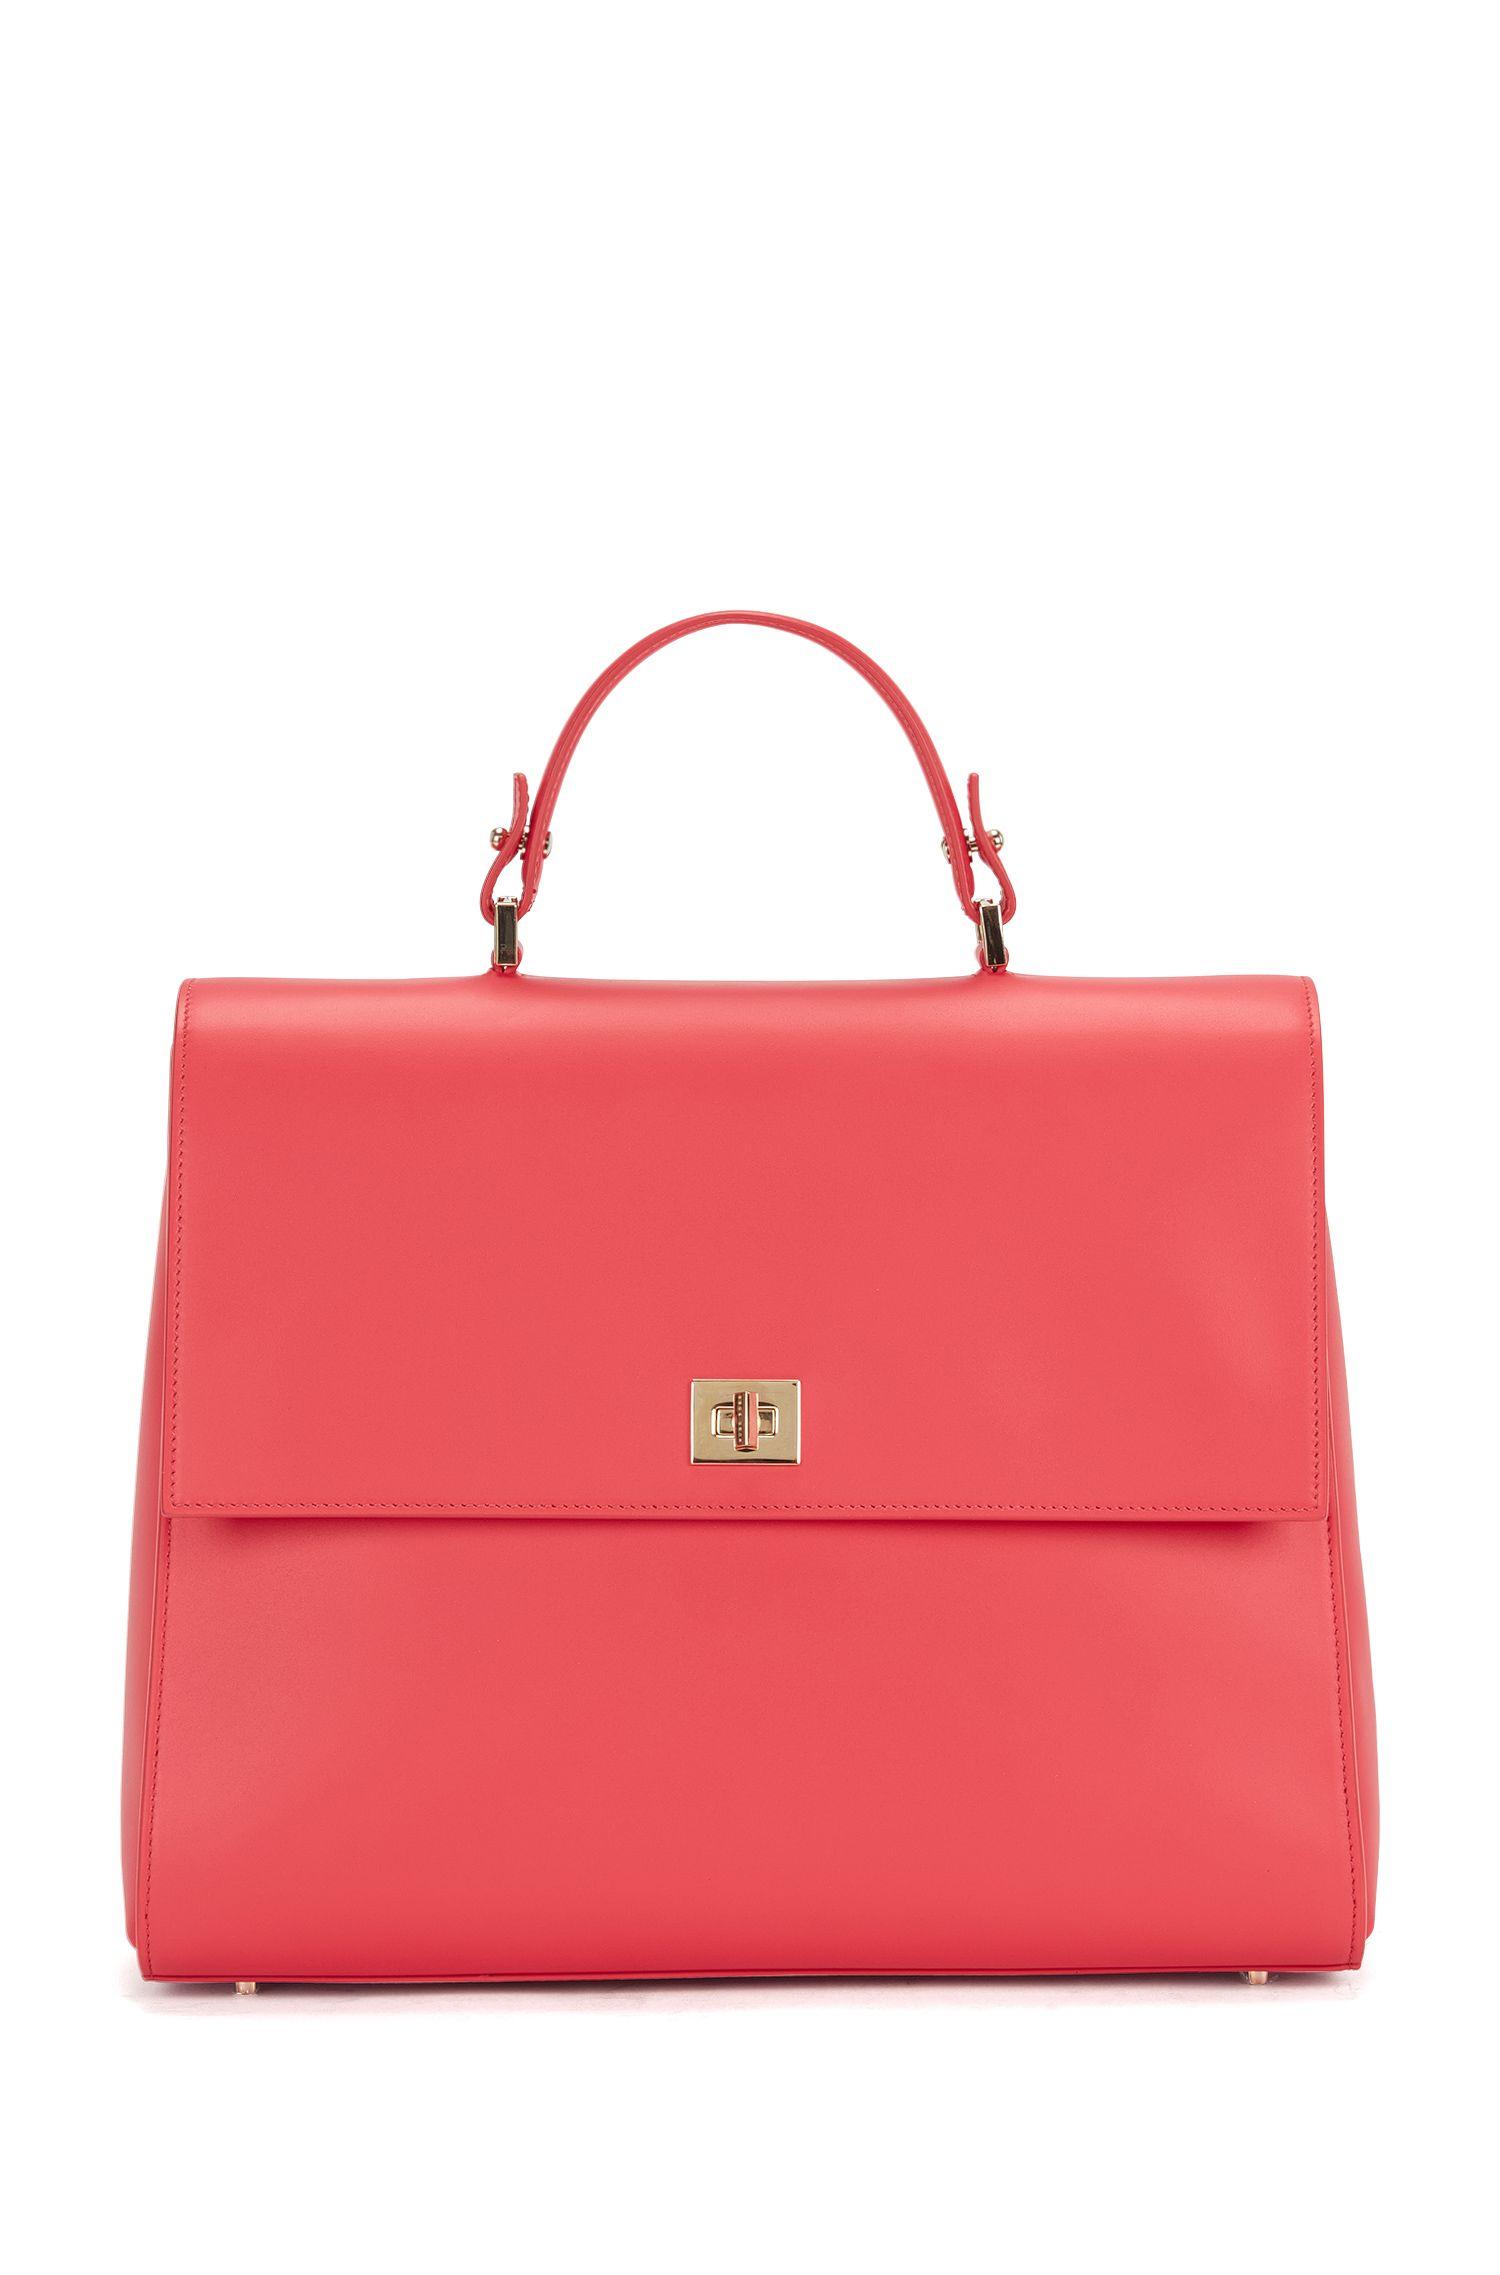 'Bespoke' | Leather Handbag, Detachable Strap